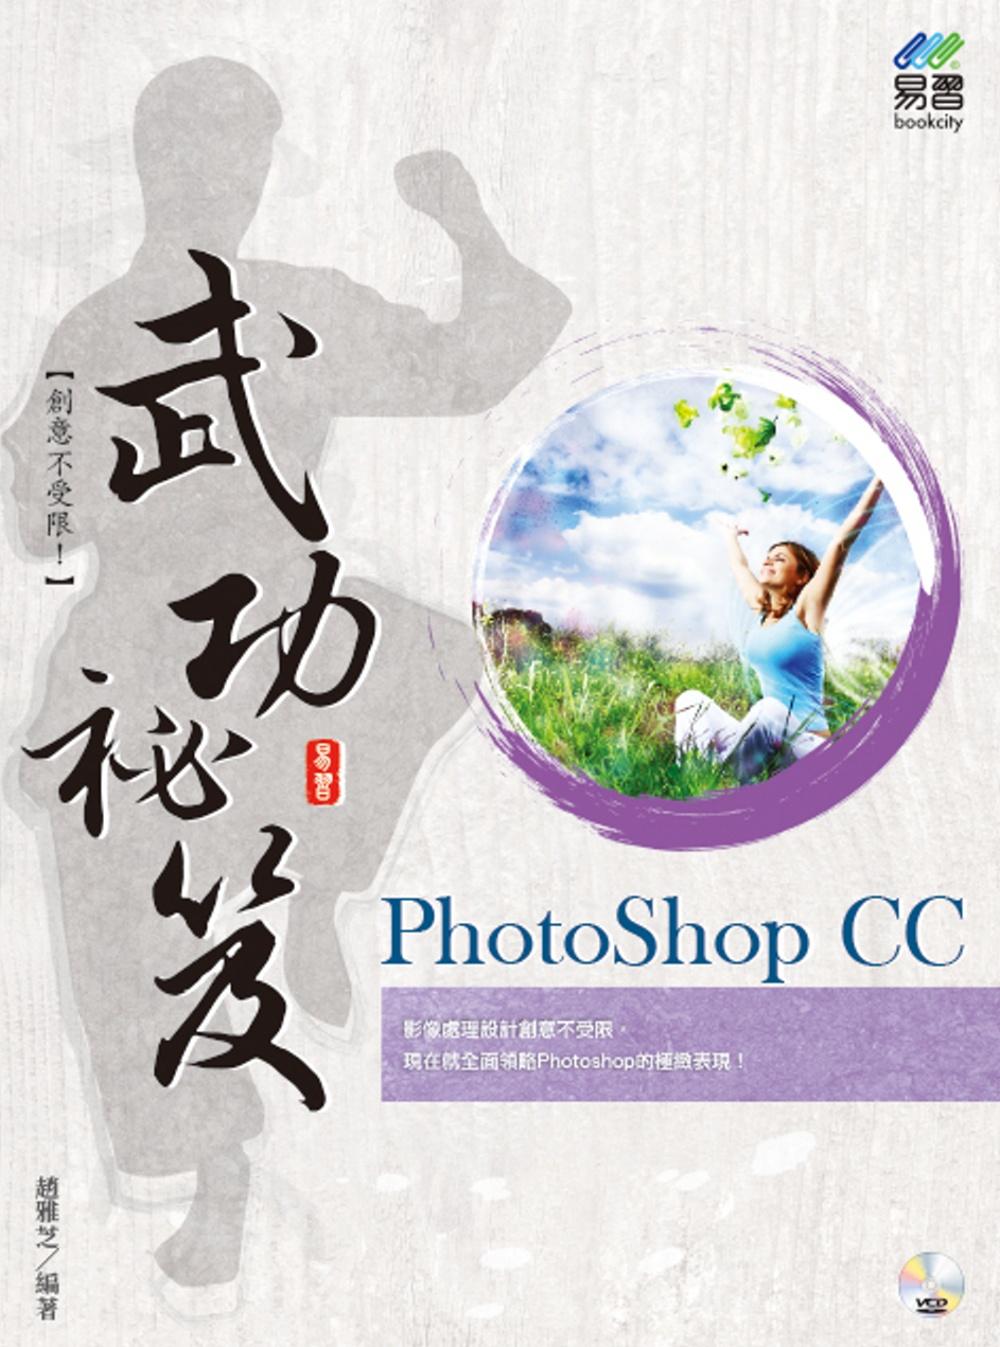 PhotoShop CC 武功...